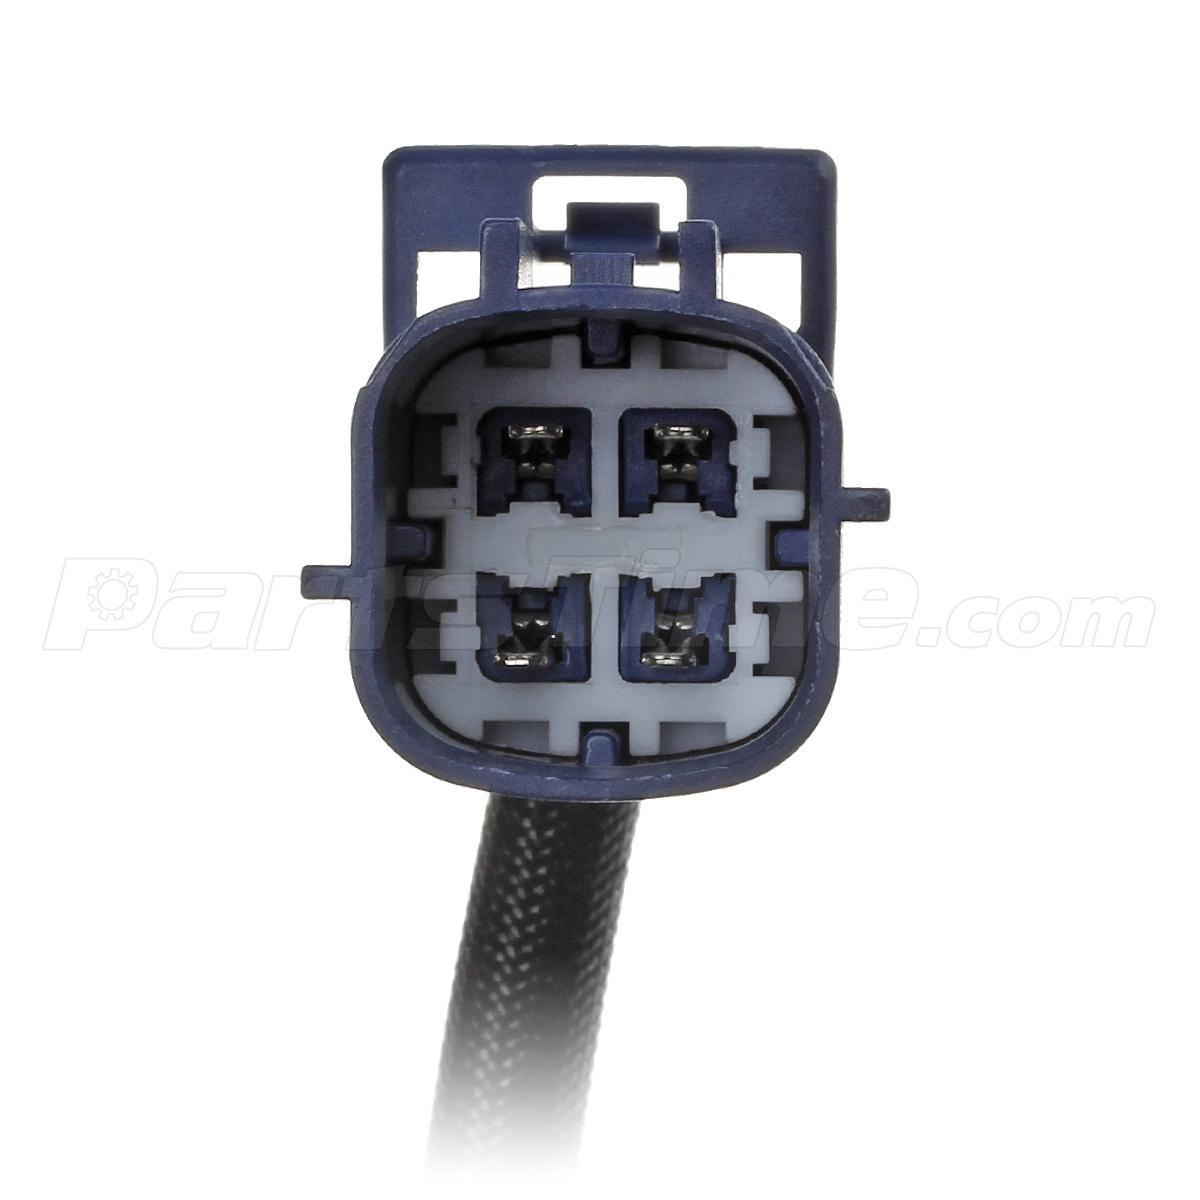 o2 sensor heater 70 watt hps wiring diagram 4x heated oxygen 1 2 bank for 05